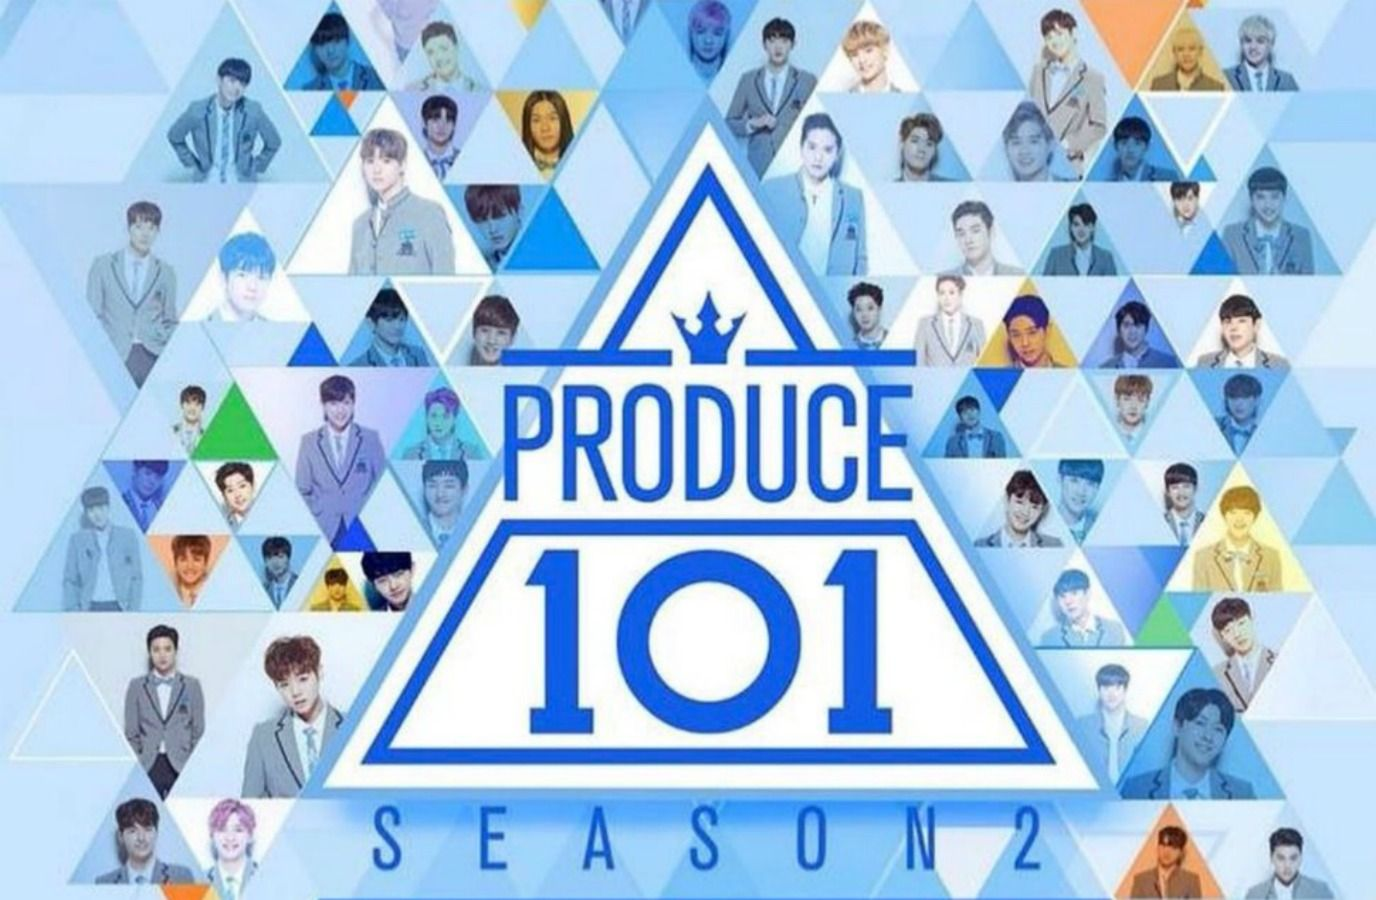 Produce 101 Season 2 Graduation Photos Revealed